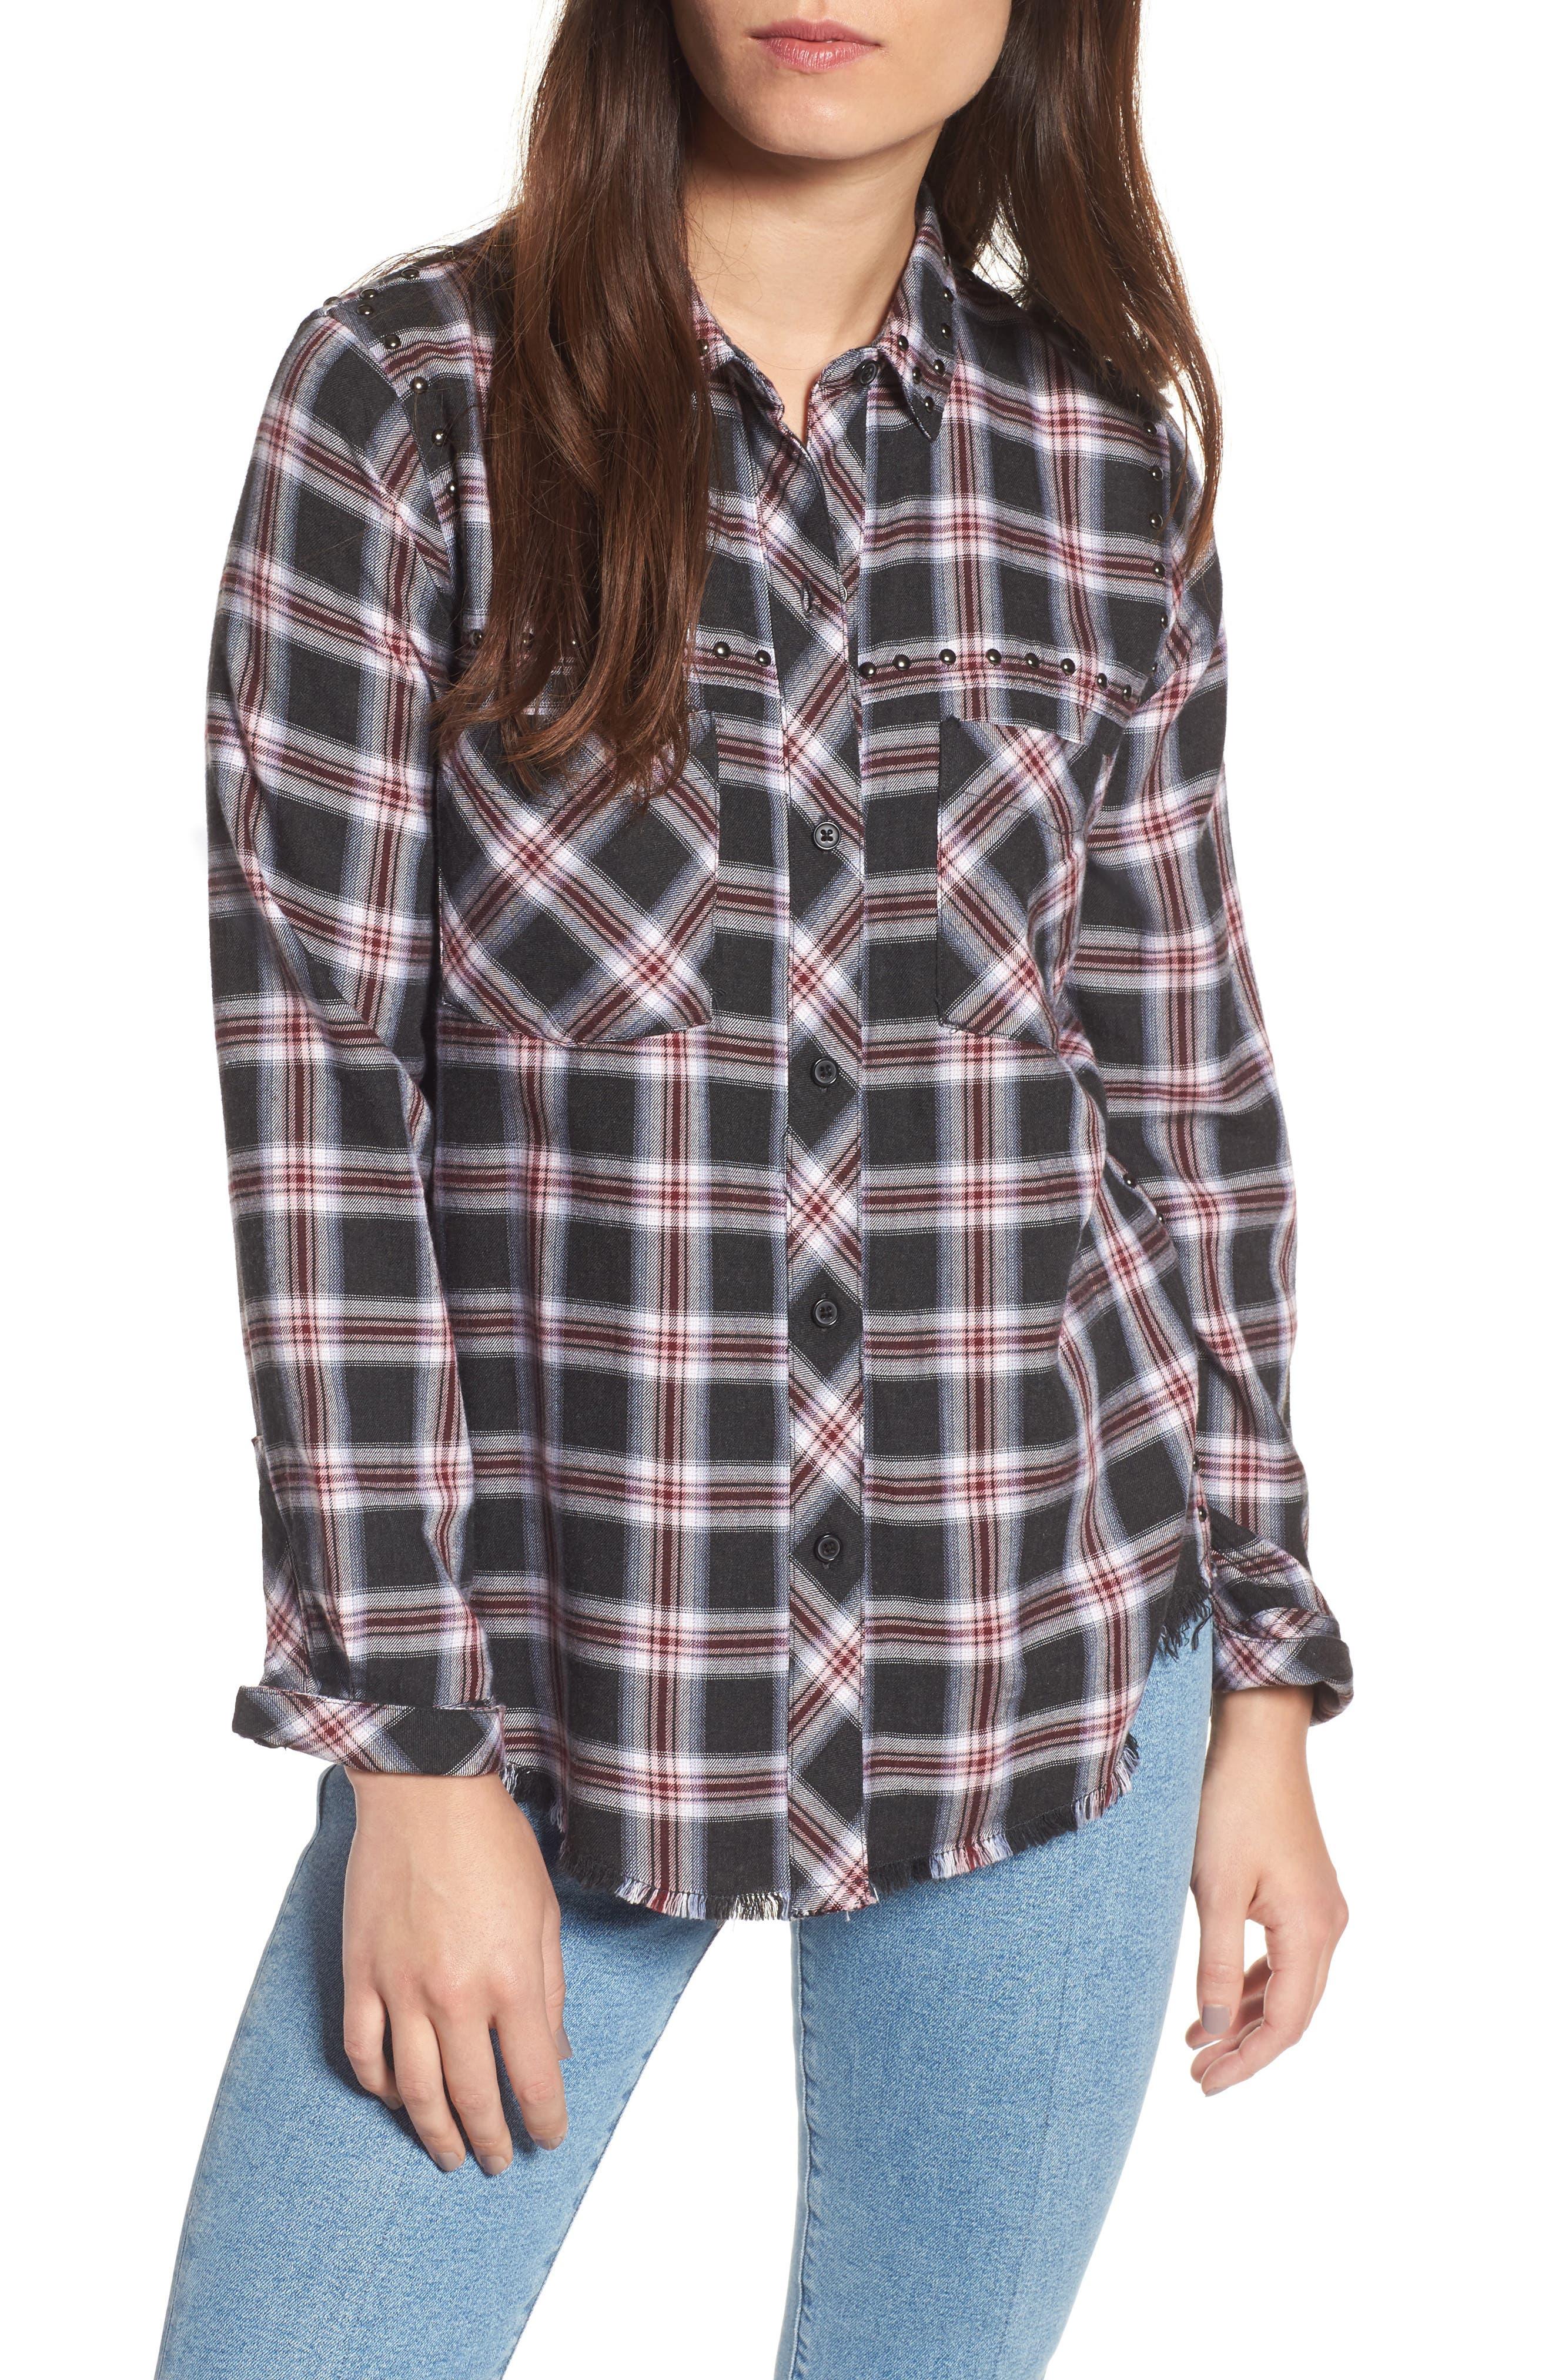 Rex Studded Plaid Shirt,                         Main,                         color, Charcoal/ Berry/ Blush